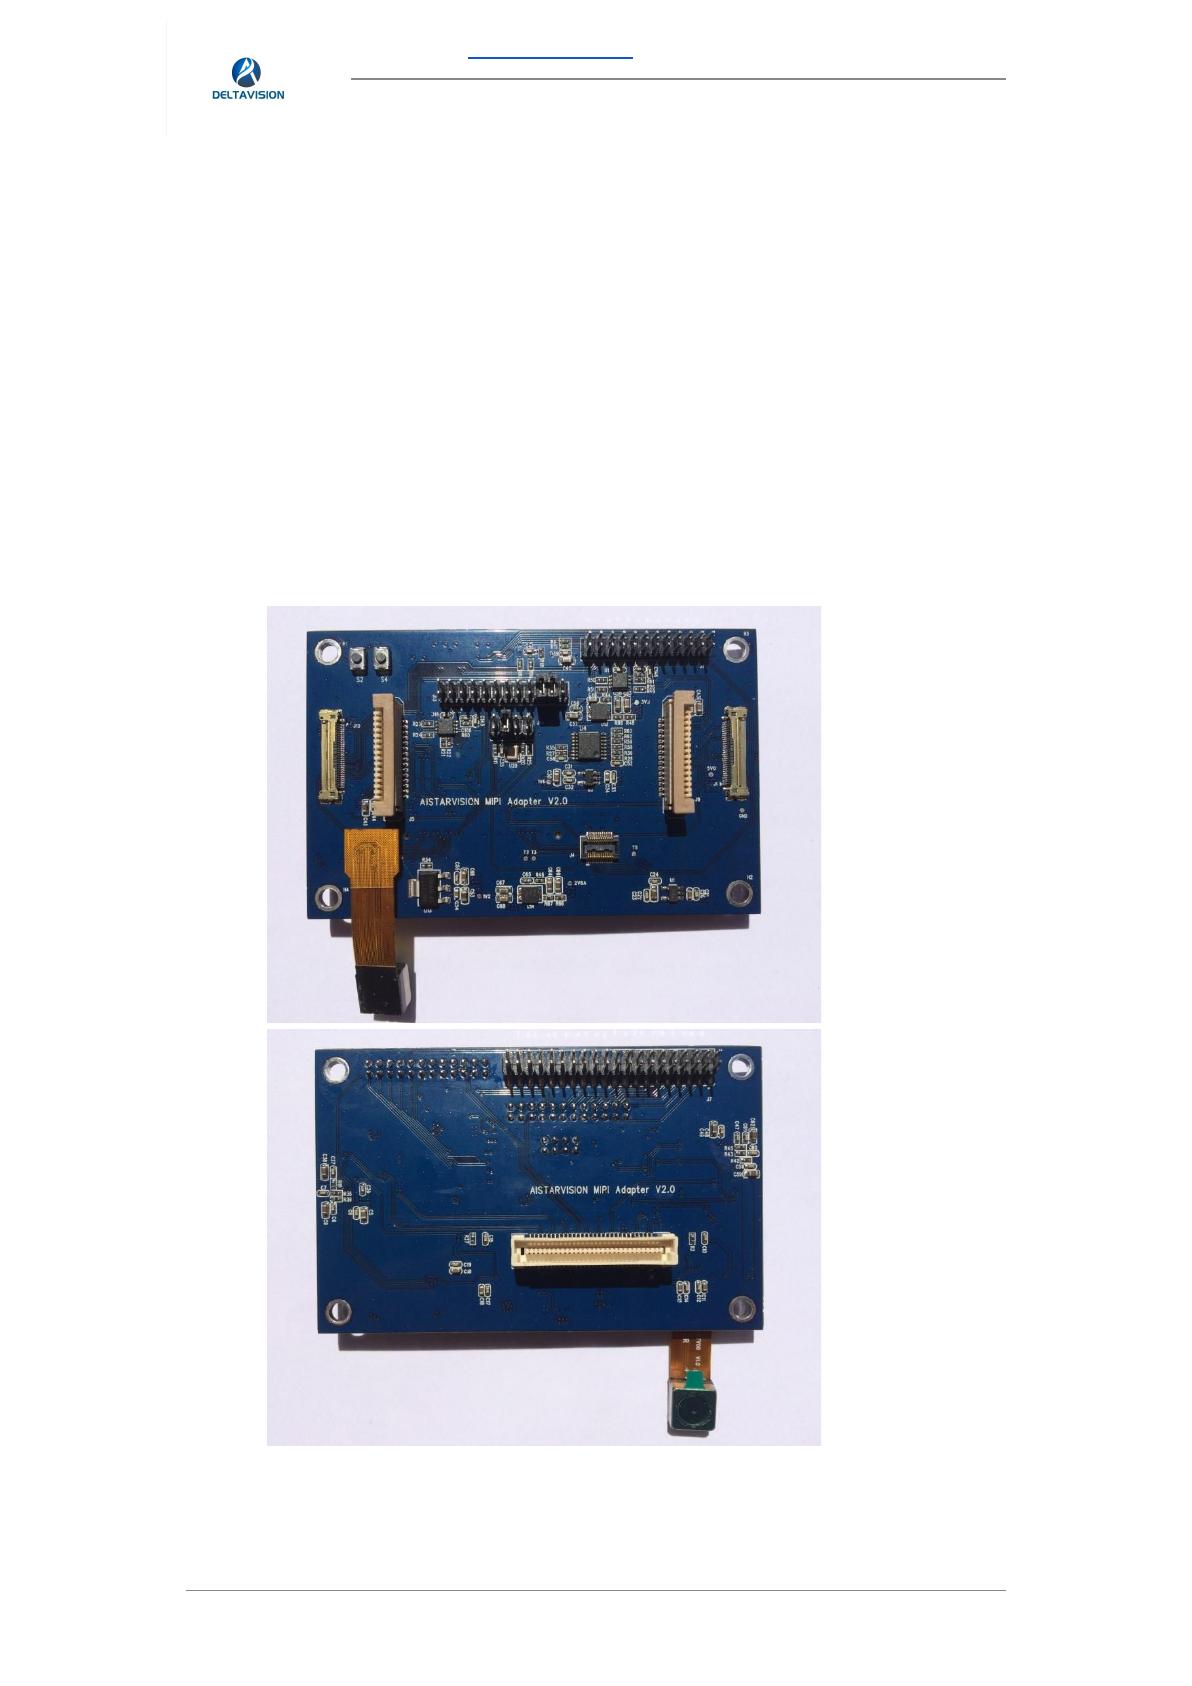 AISTARVISION MIPI Adapter V2 0 User Guidex